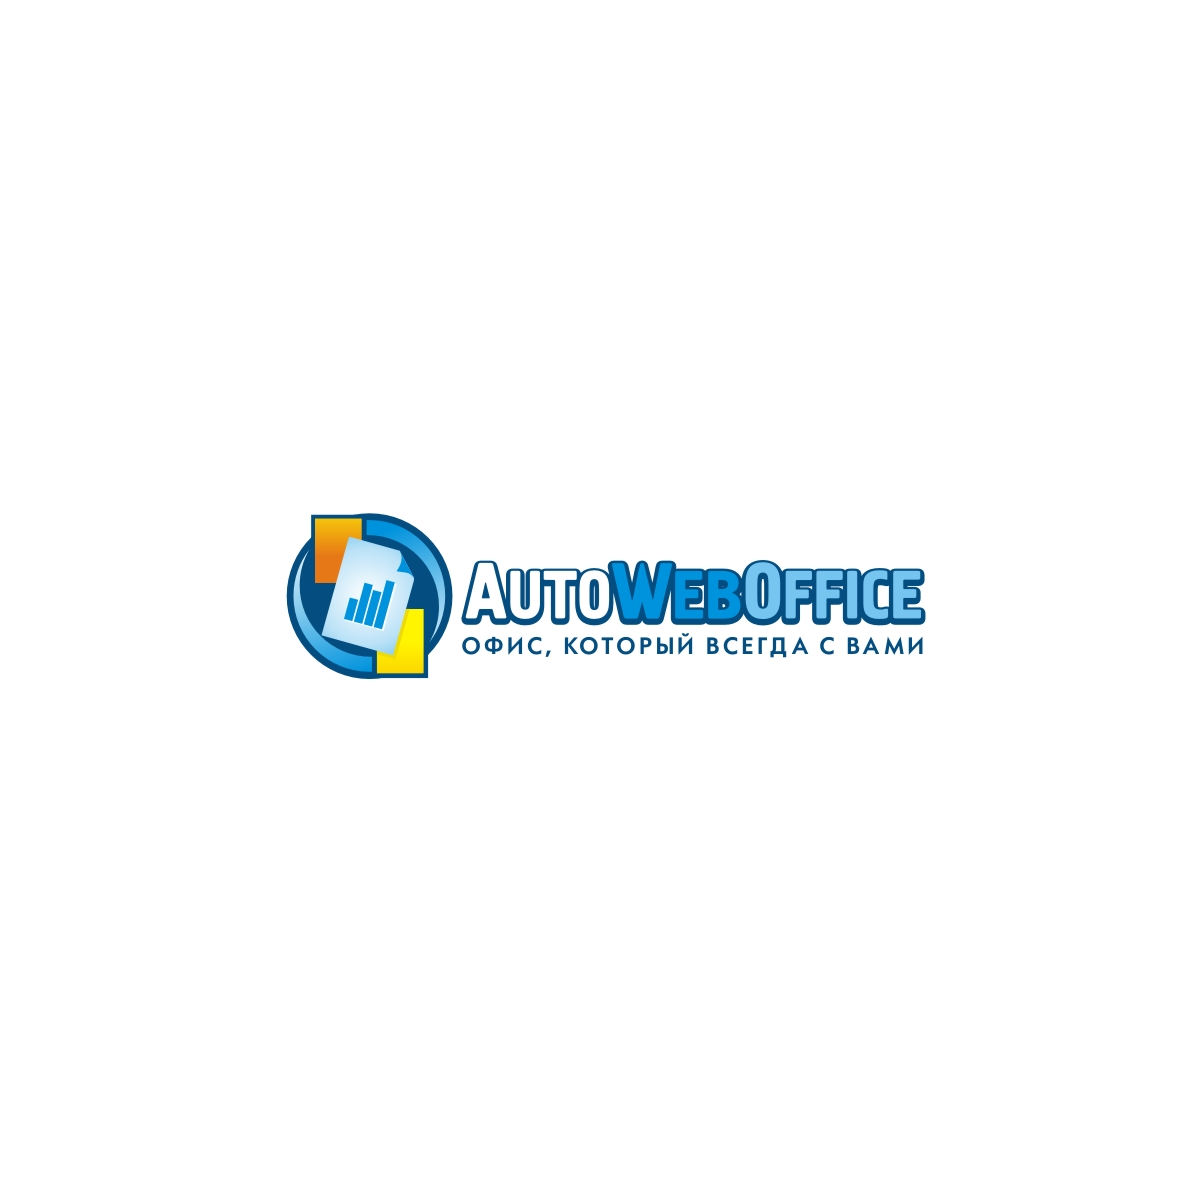 нужно разработать логотип компании фото f_0905579ef7dc6e95.jpg